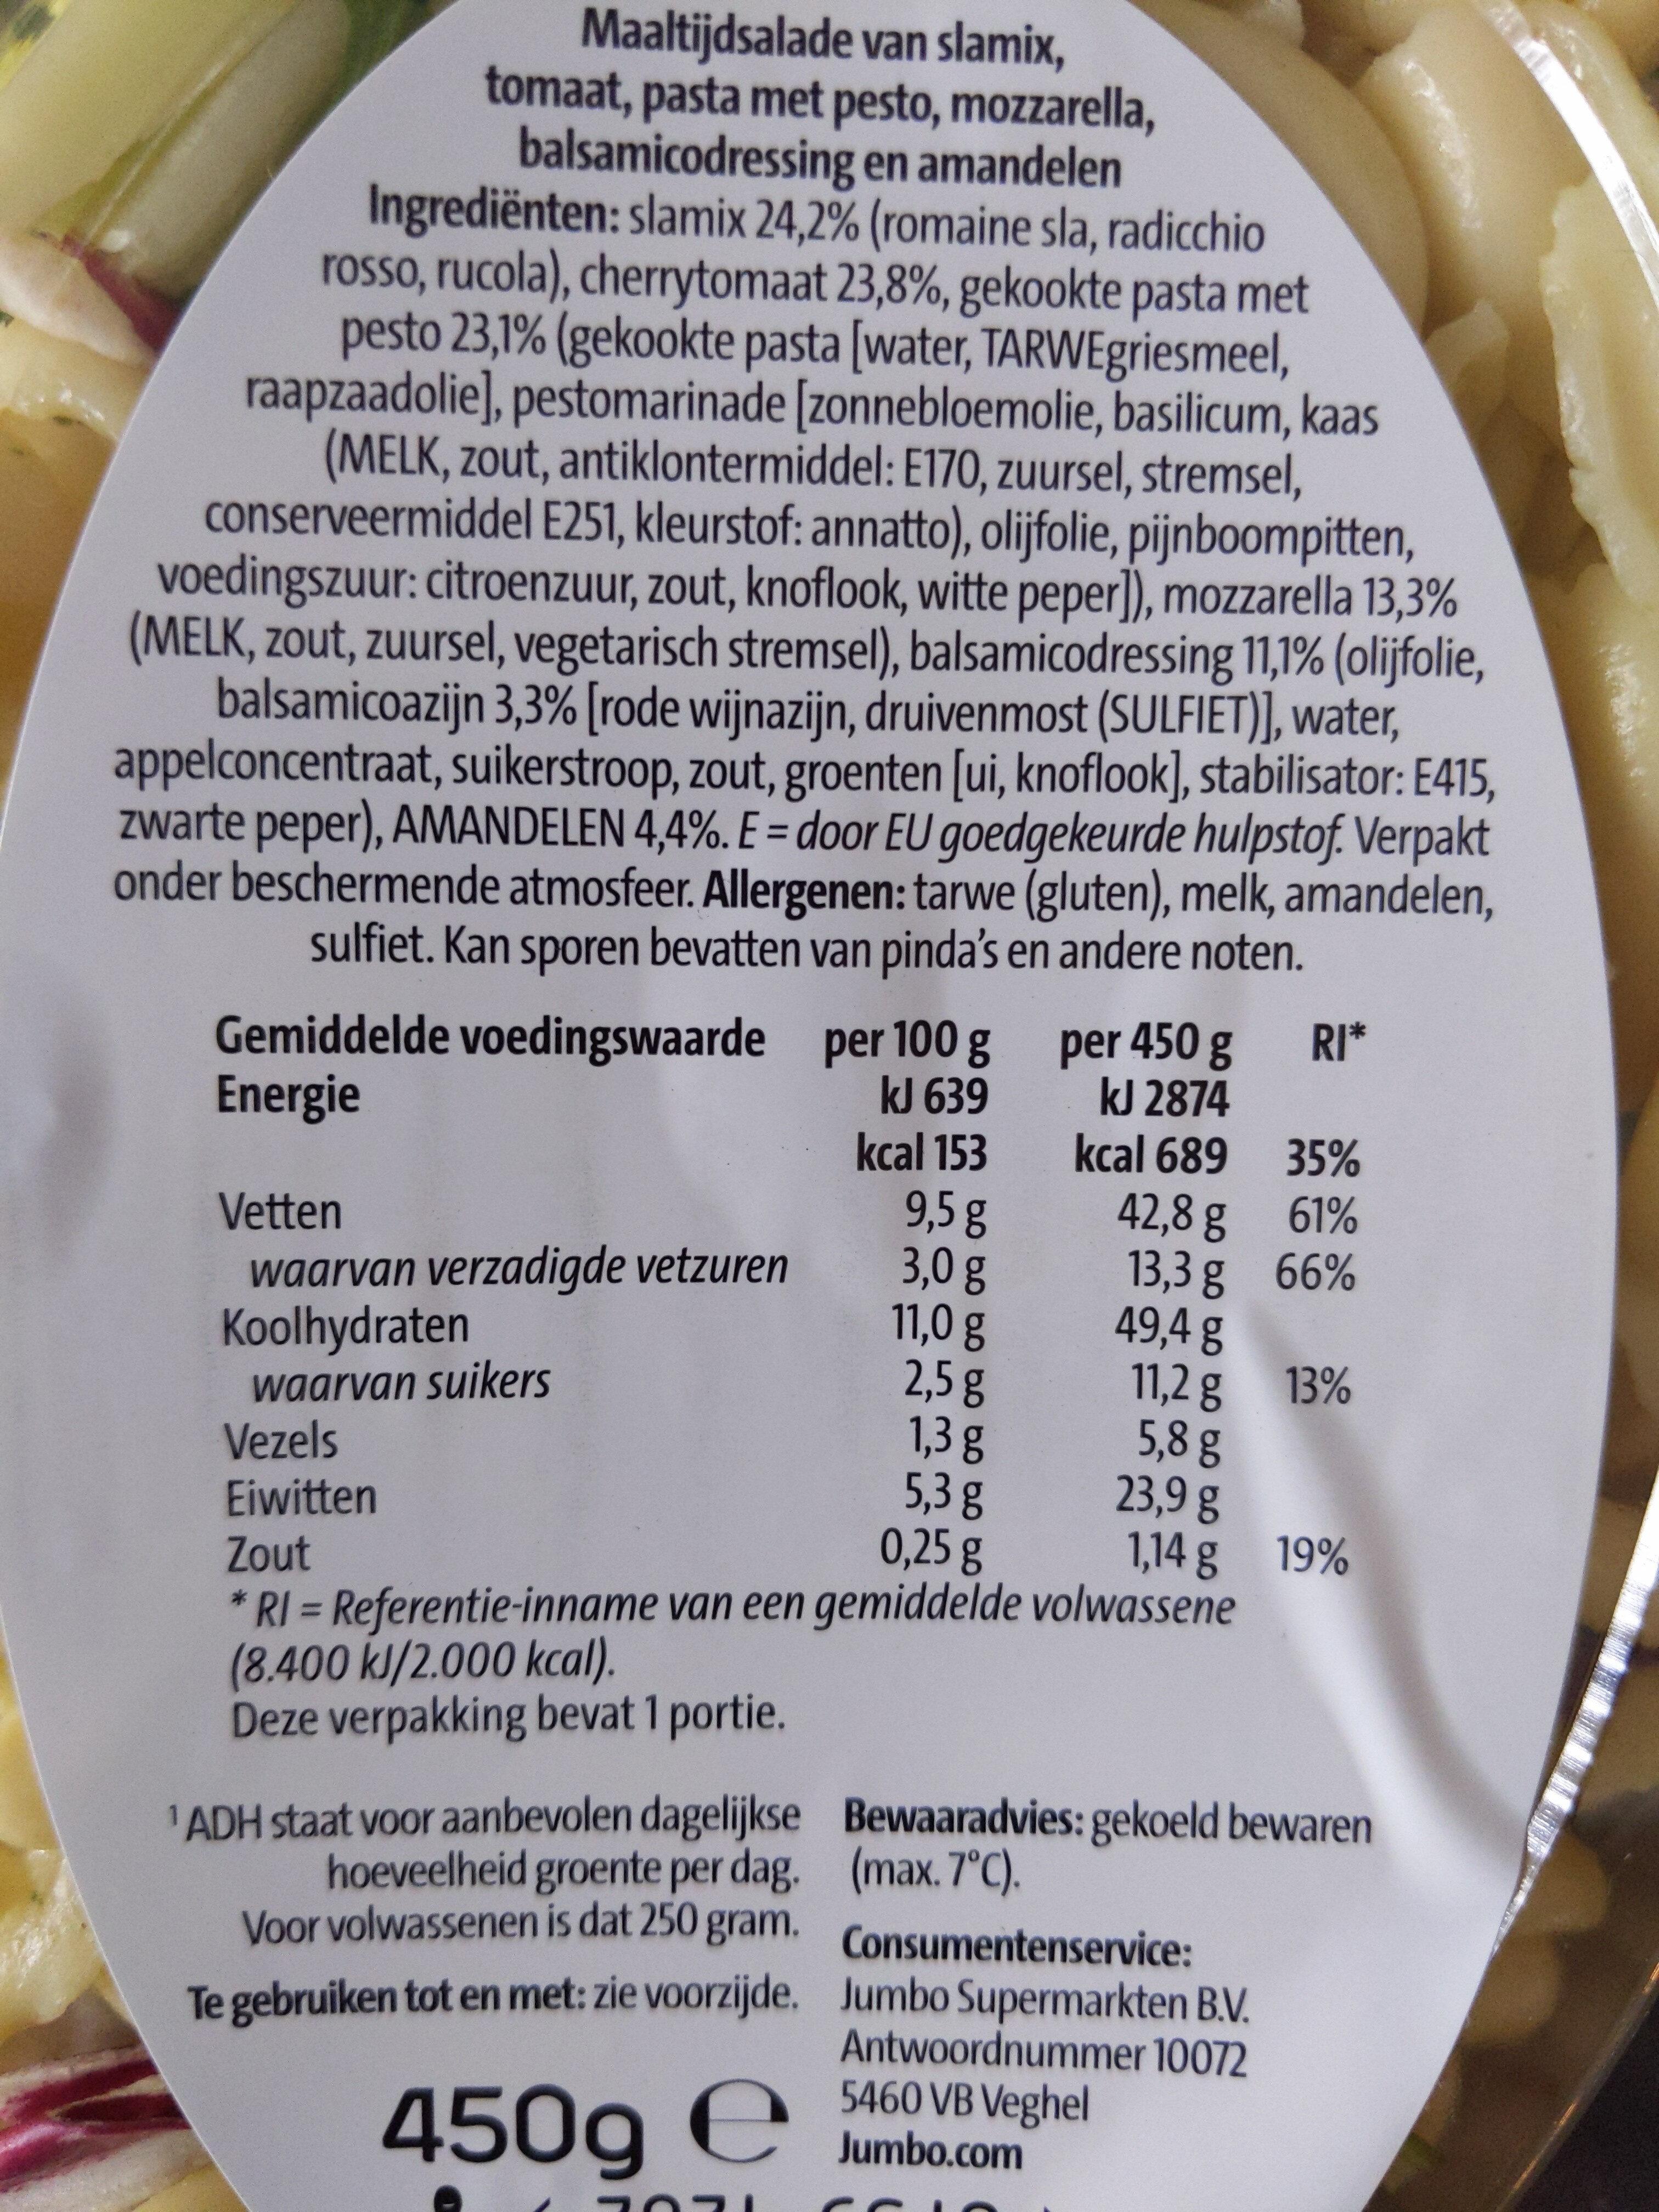 Maaltijdsalade Mozzarella - Ingredients - nl